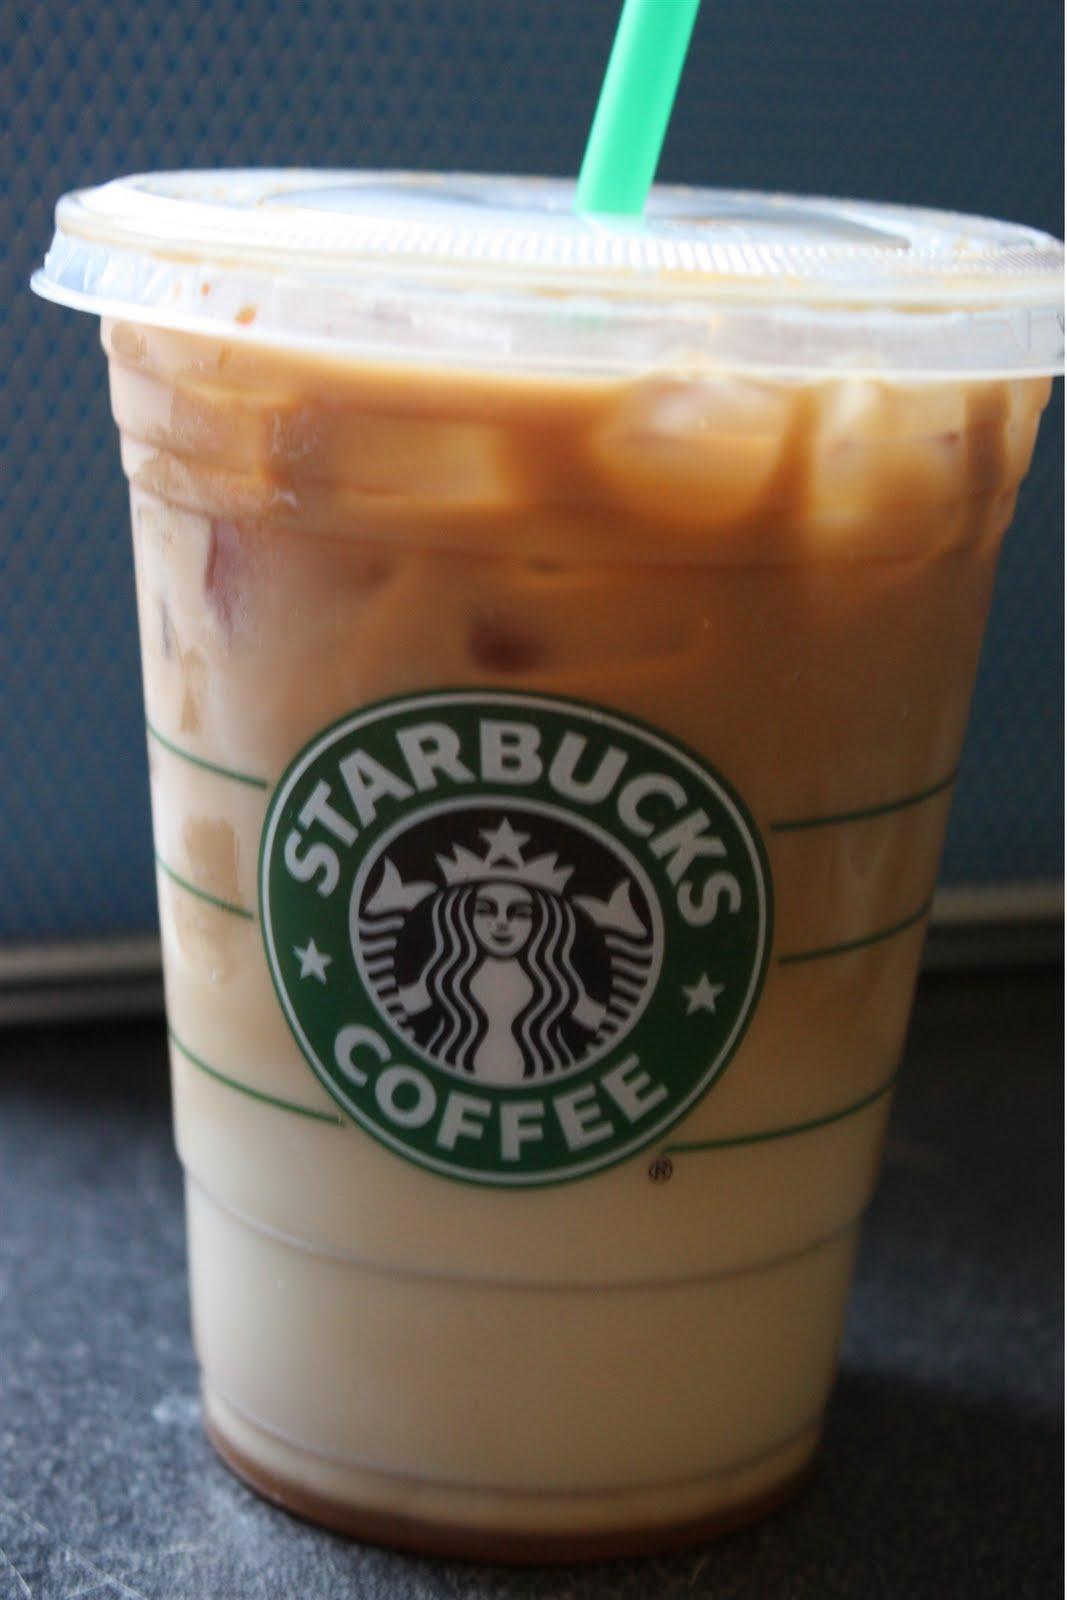 There are calories in 1 serving of Starbucks Skinny Caramel Macchiato (Grande). Calorie breakdown: 7% fat, 61% carbs, 32% protein.